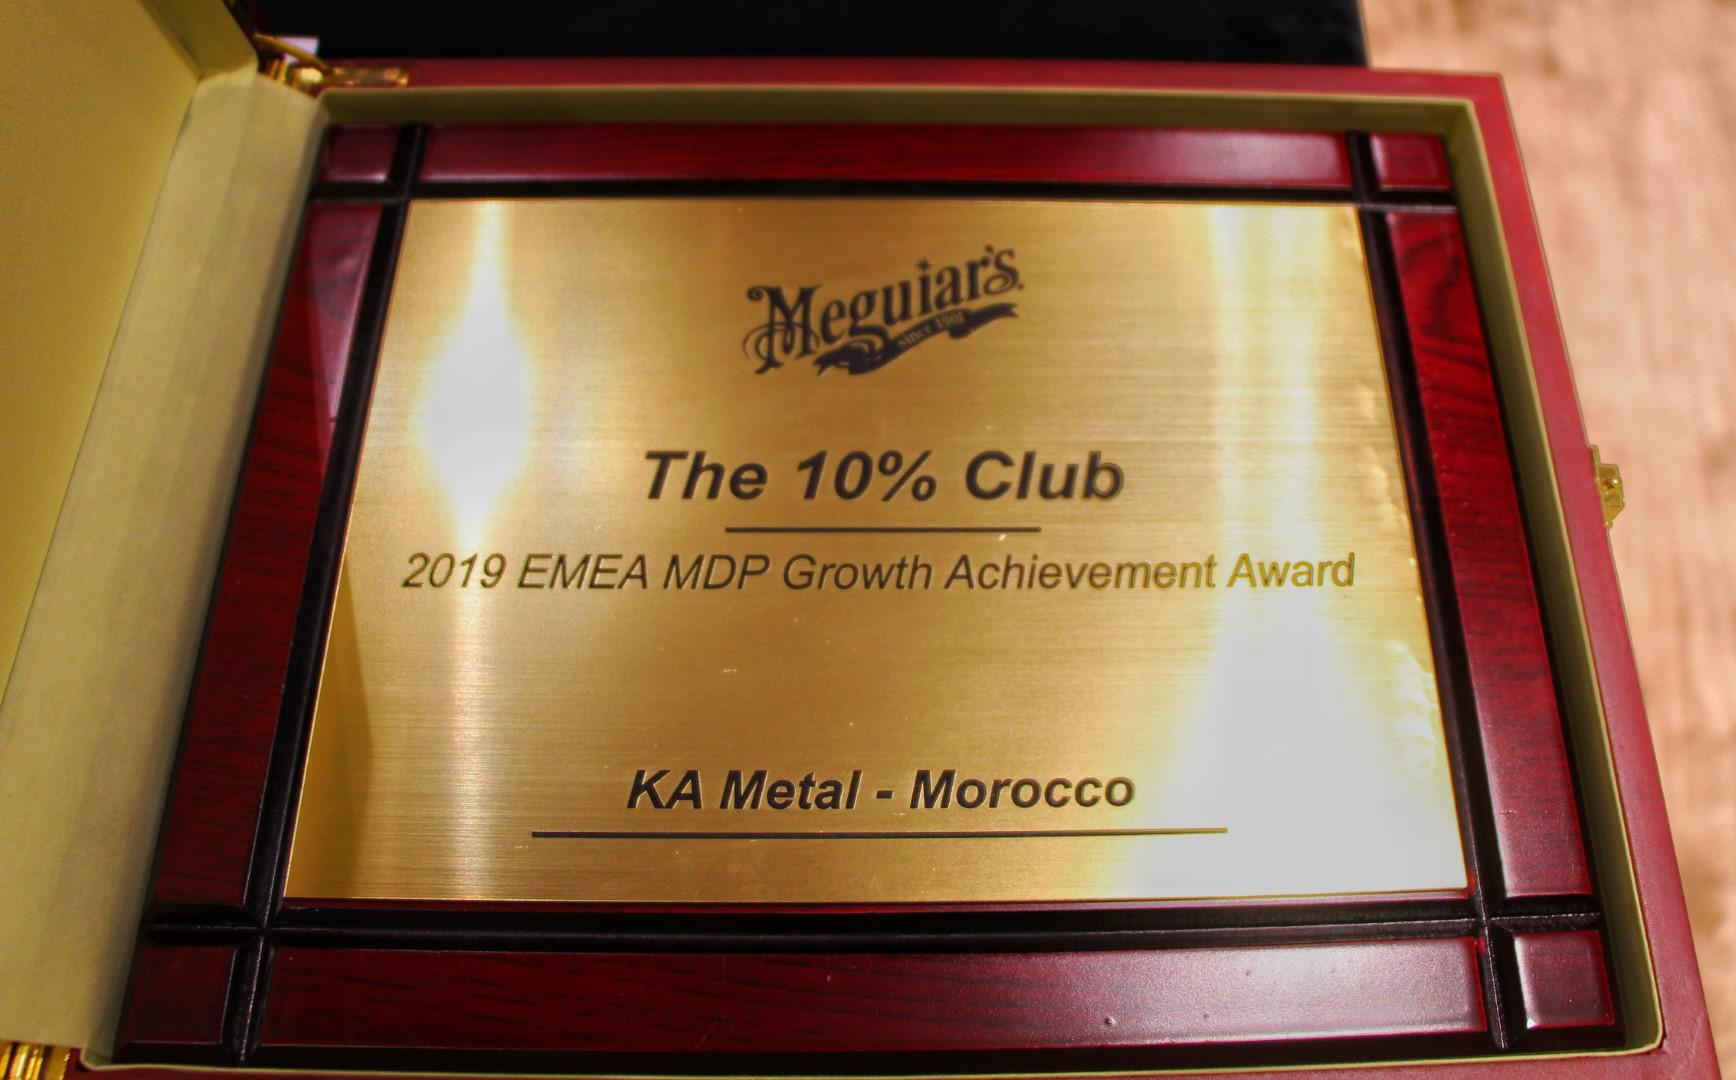 meguiar-s-maroc-impressionne-au-mdp-2020-1228-4.jpg